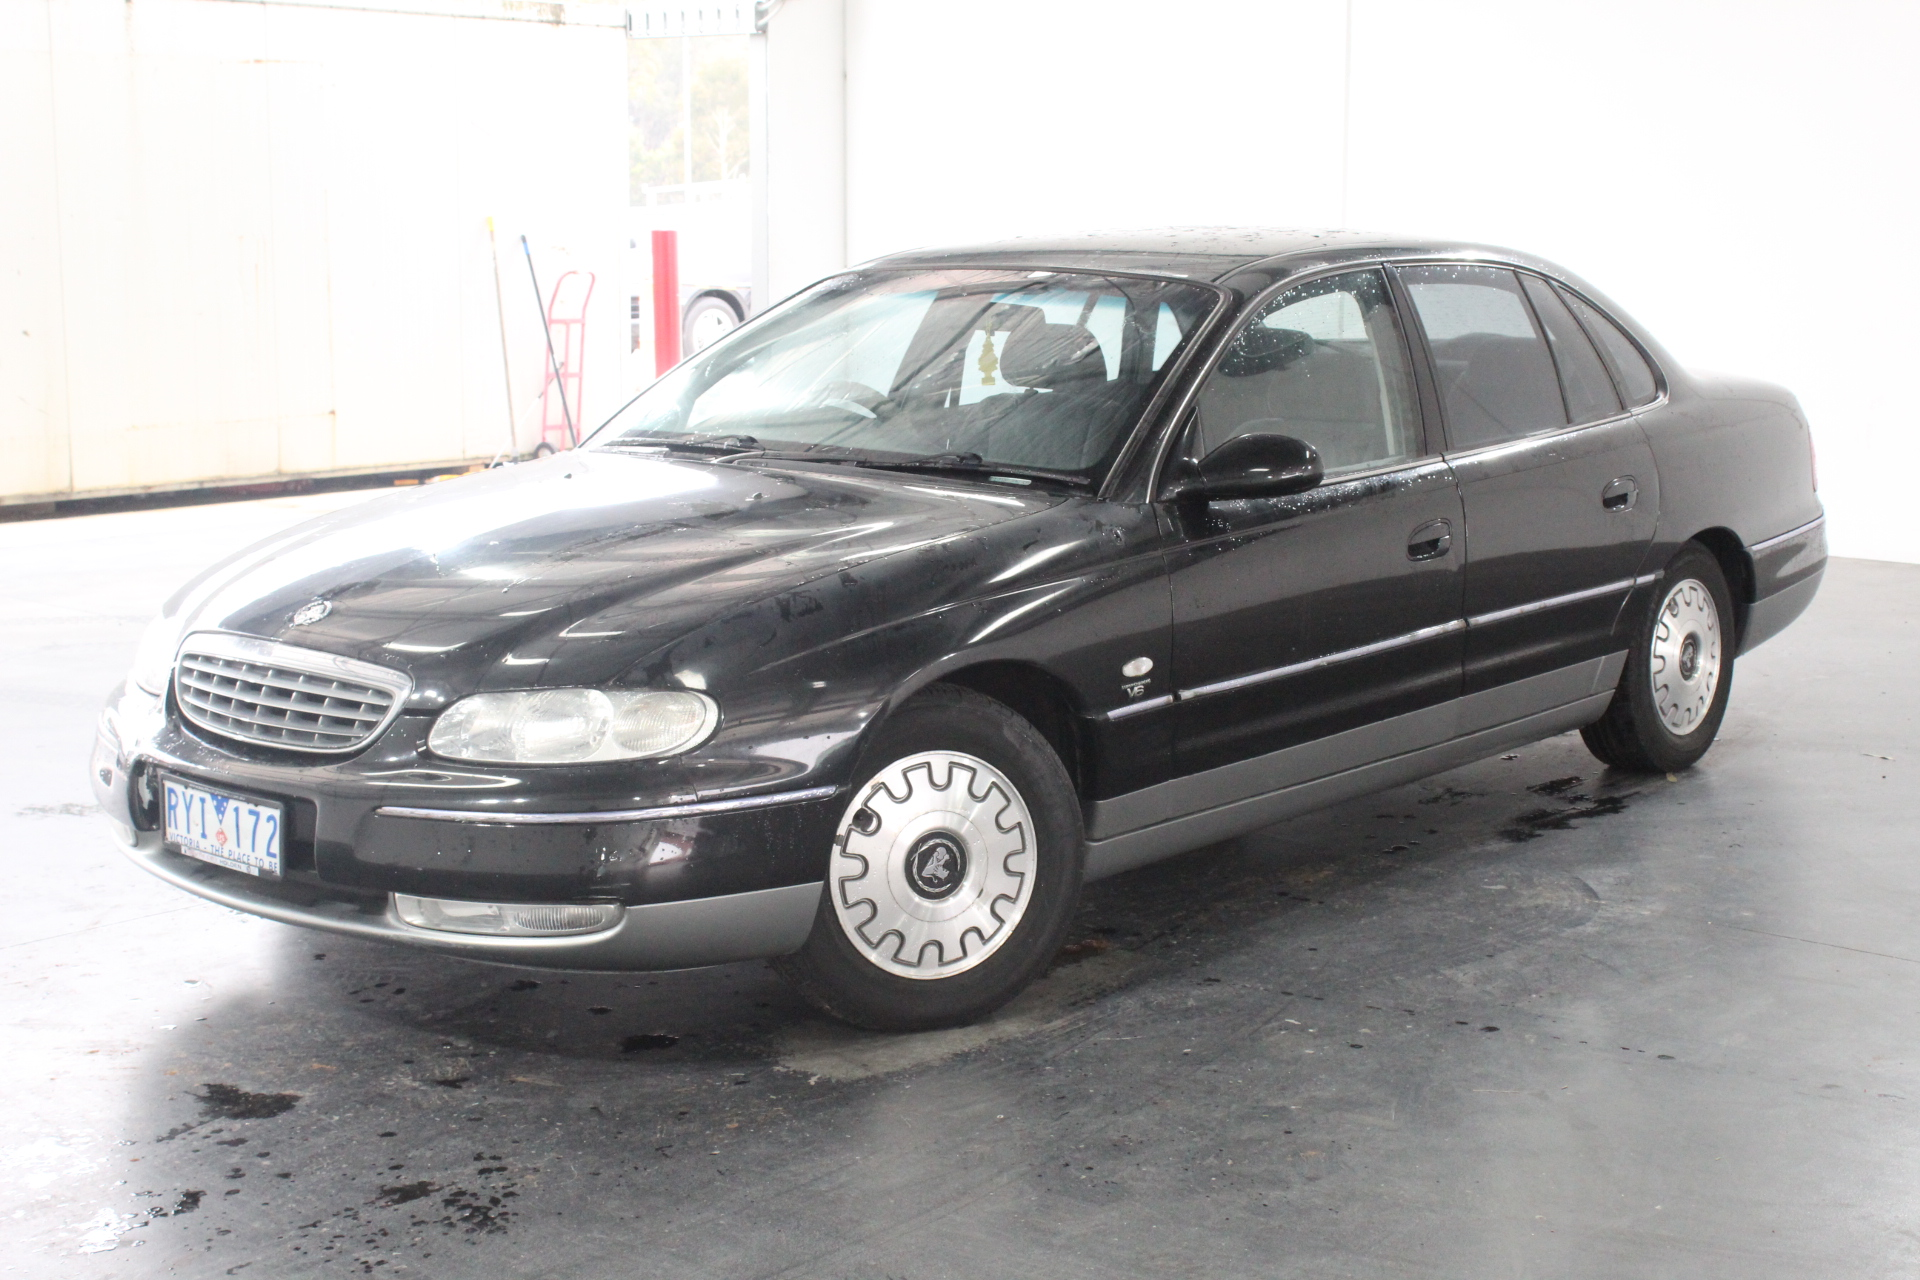 2001 Holden Statesman V6 WH Automatic Sedan